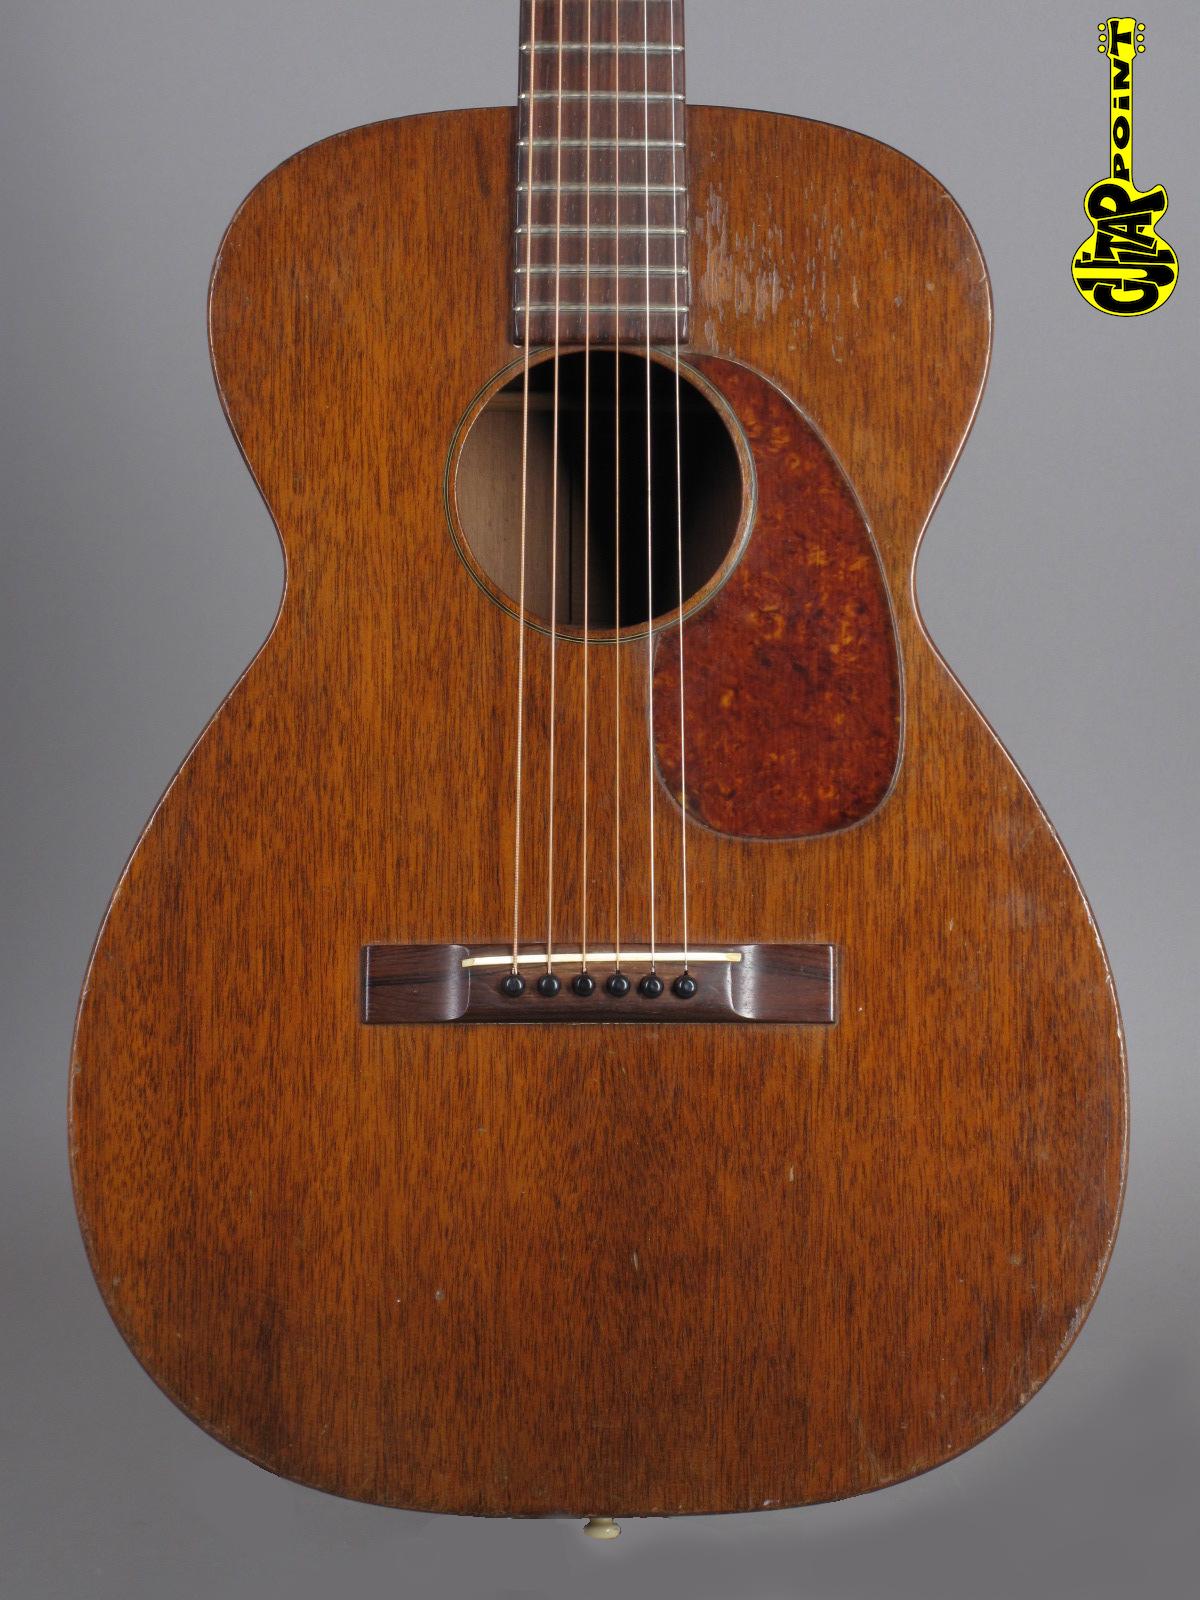 1957 Martin 0-15 Natural